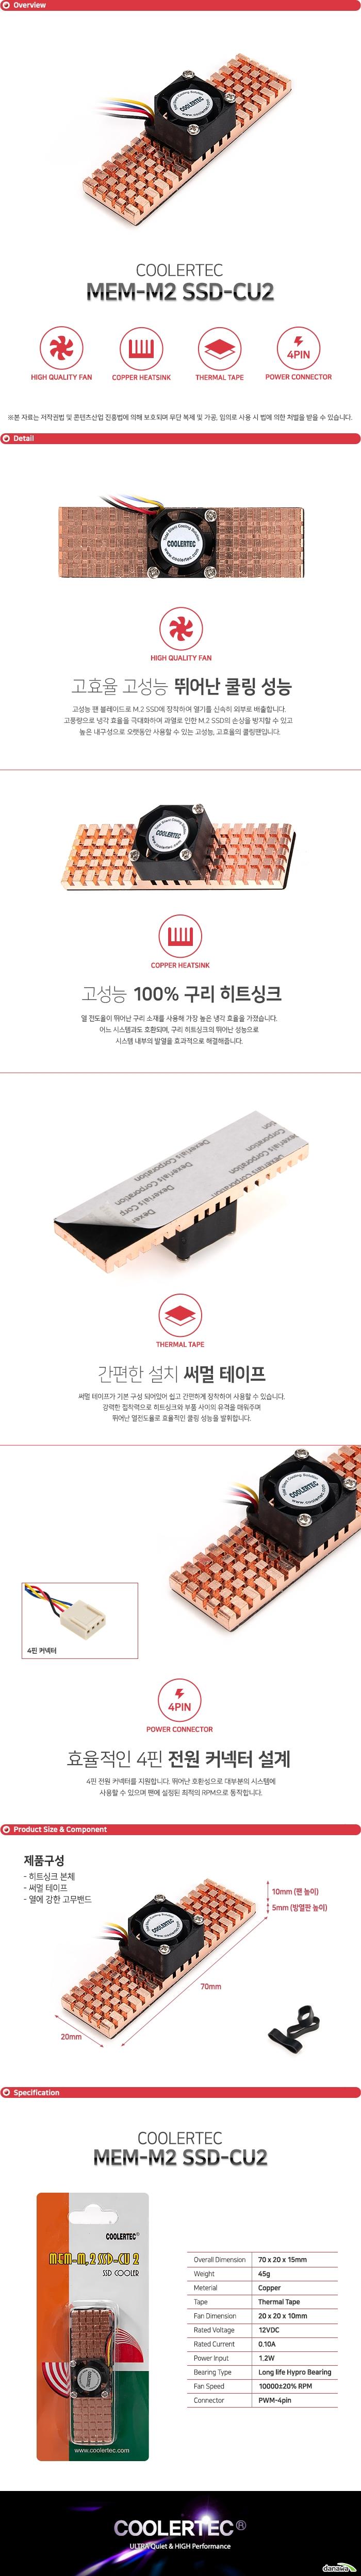 COOLERTEC MEM-M2 SSD-CU2